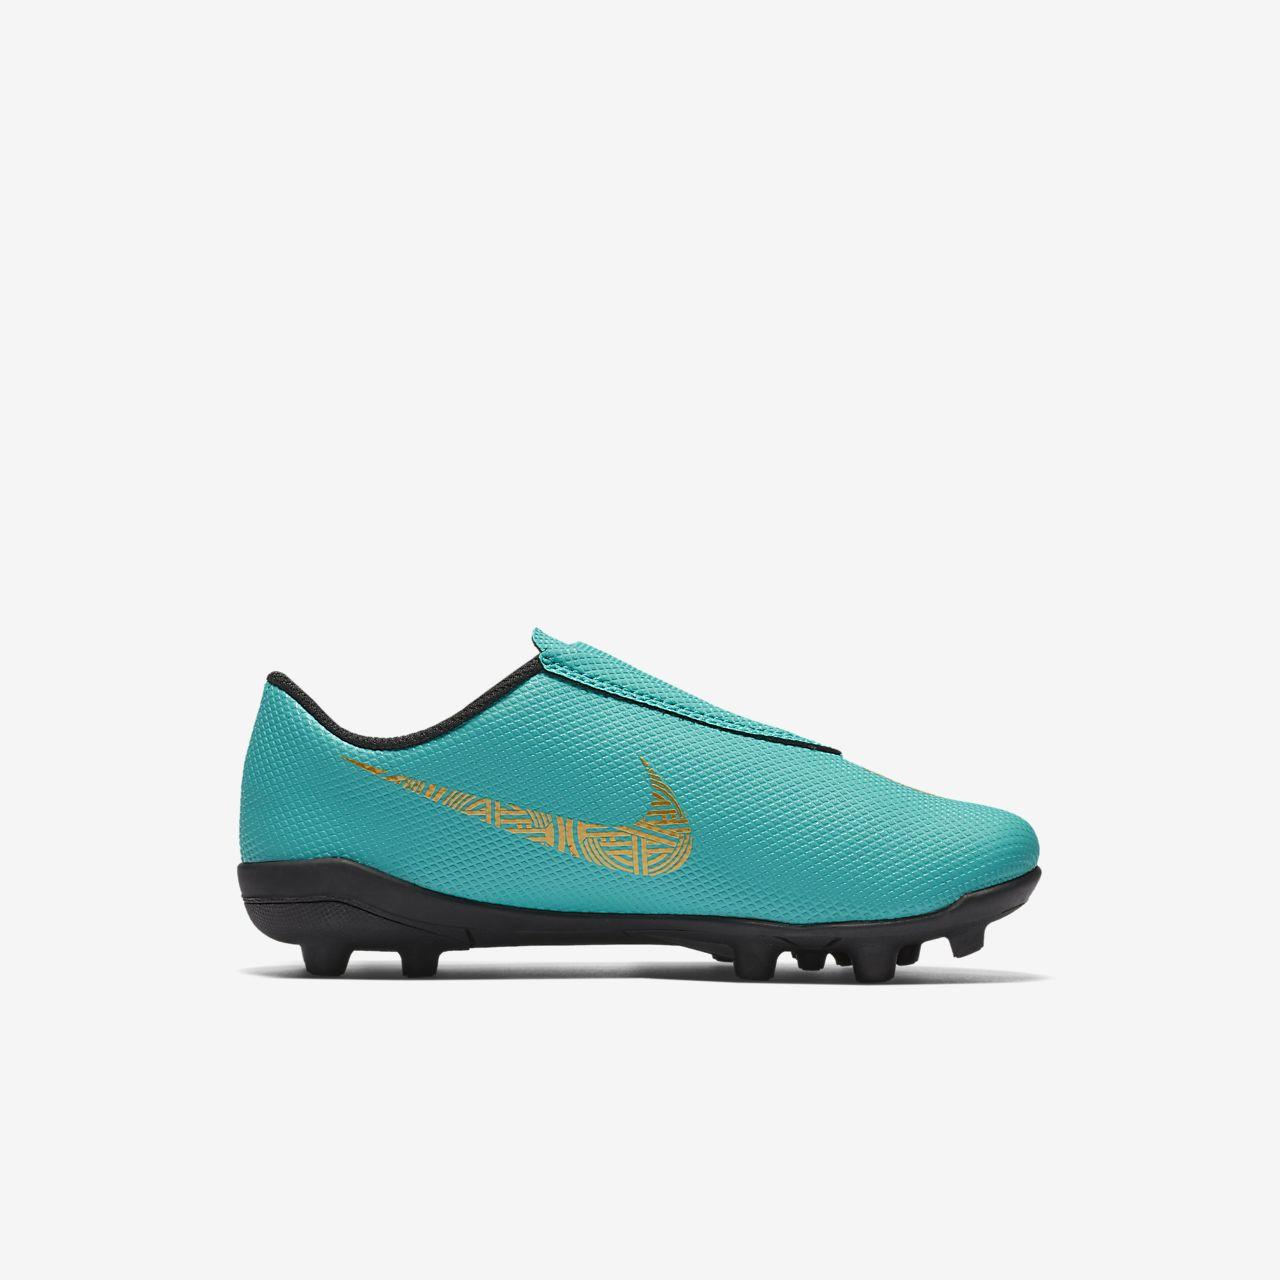 Nike Jr. Mercurial Vapor XII Club CR7 MG ToddlerYounger Kids' Multi Ground Football Boot